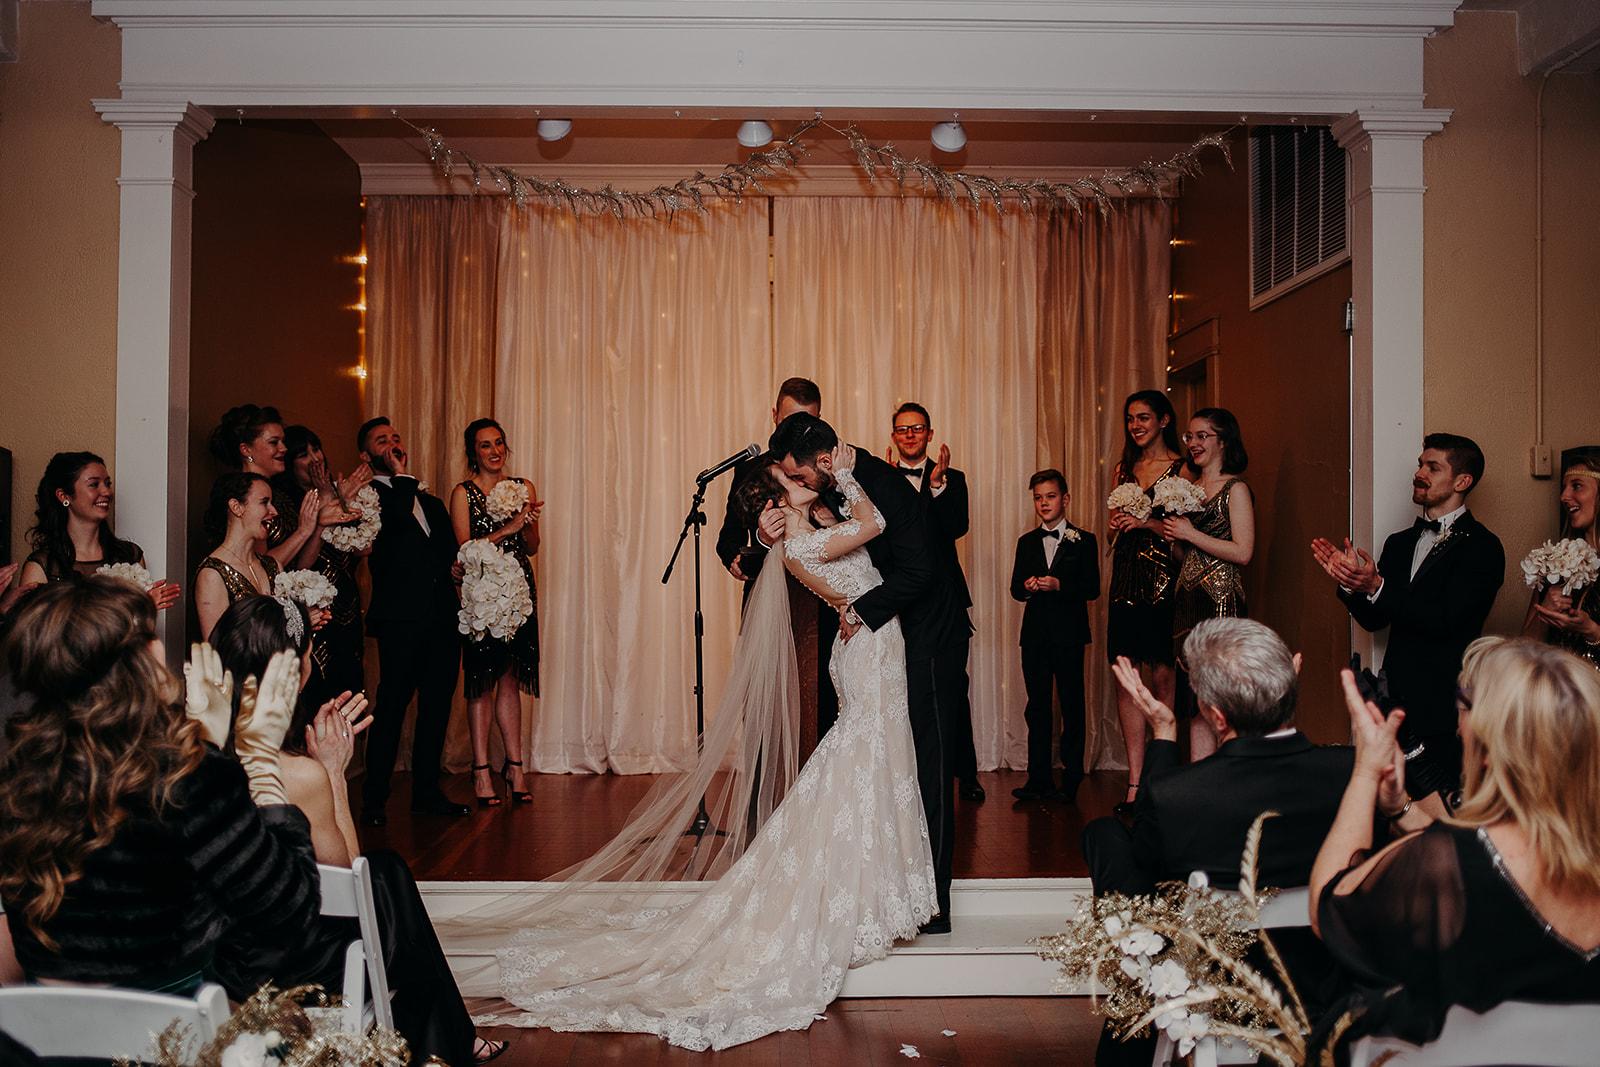 levi-natalie-wedding-bellingham-broadway-hall-reception (4 of 5).jpg